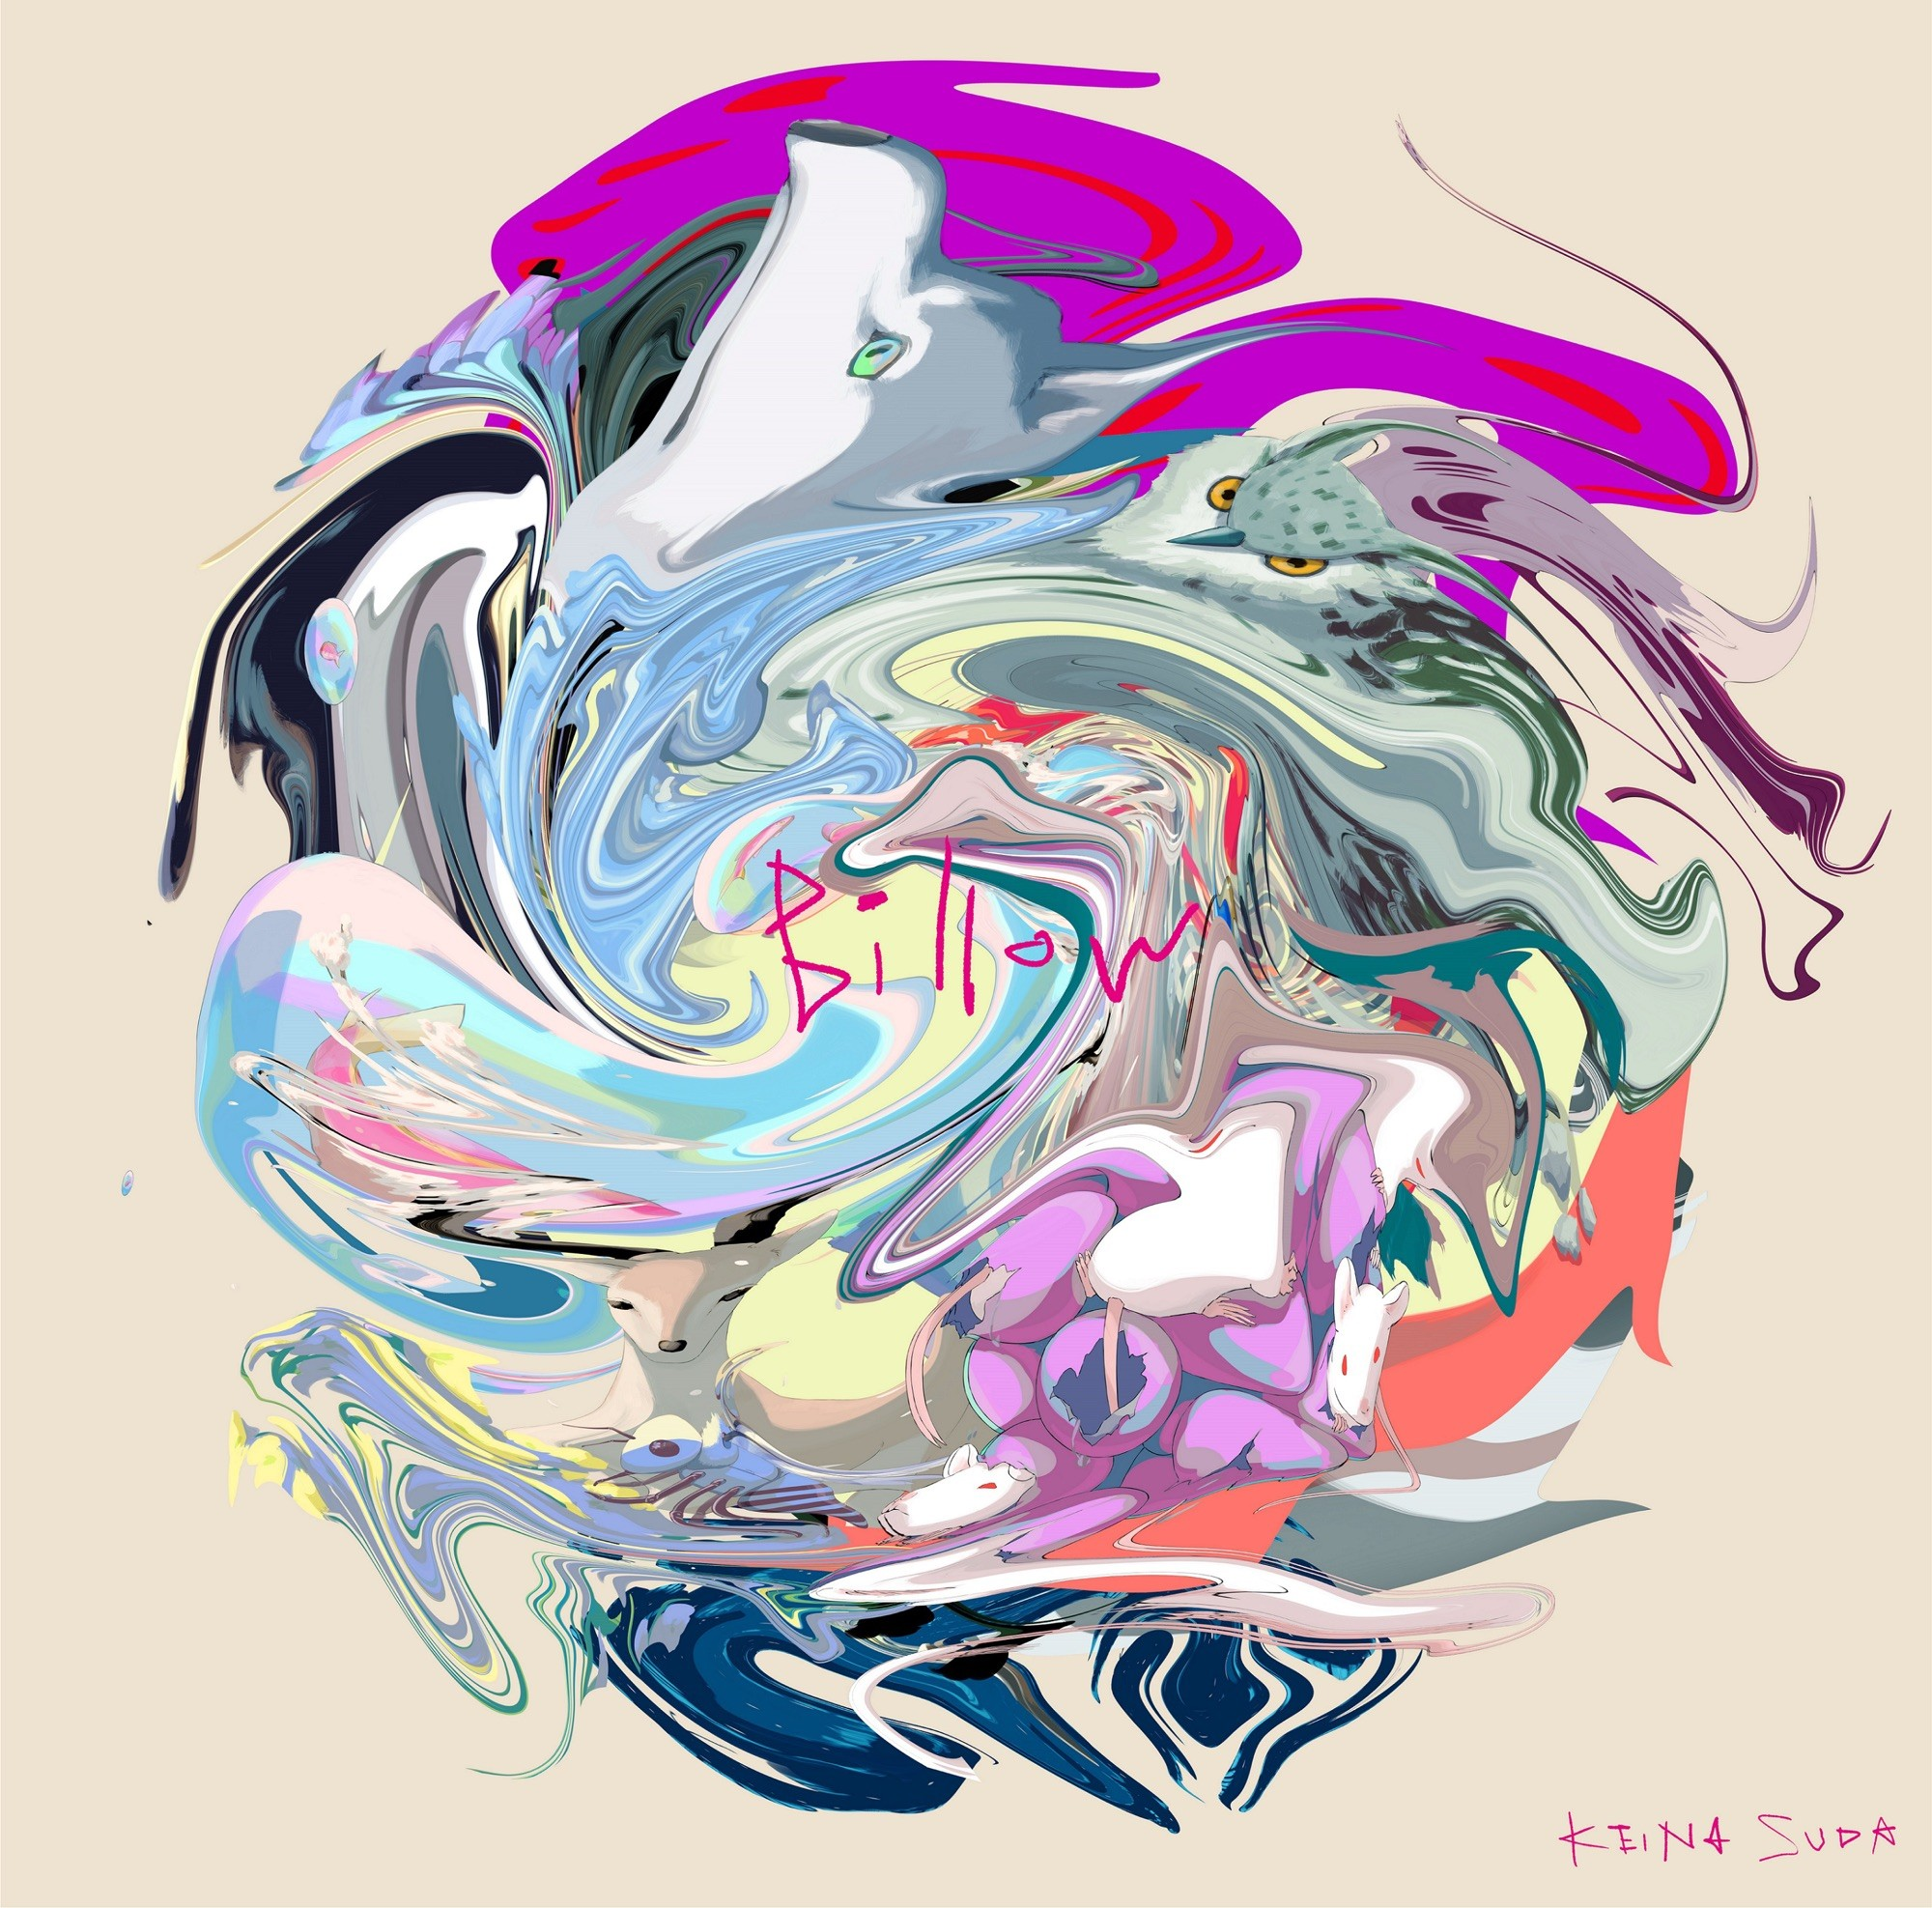 [Album] 須田景凪 (Keina Suda) – Billow [FLAC / WEB] [2021.02.03]